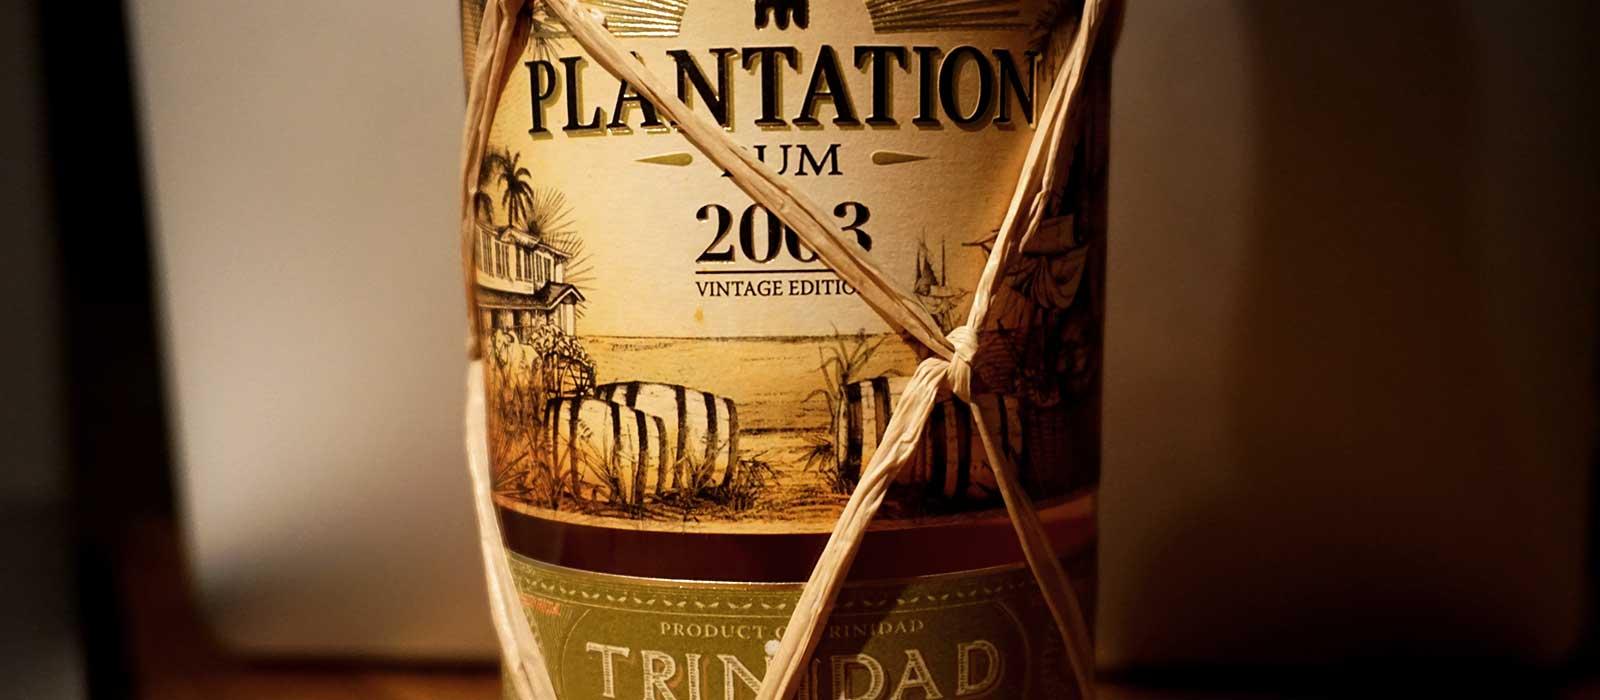 Guld 2016: Plantation Trinidad 2003